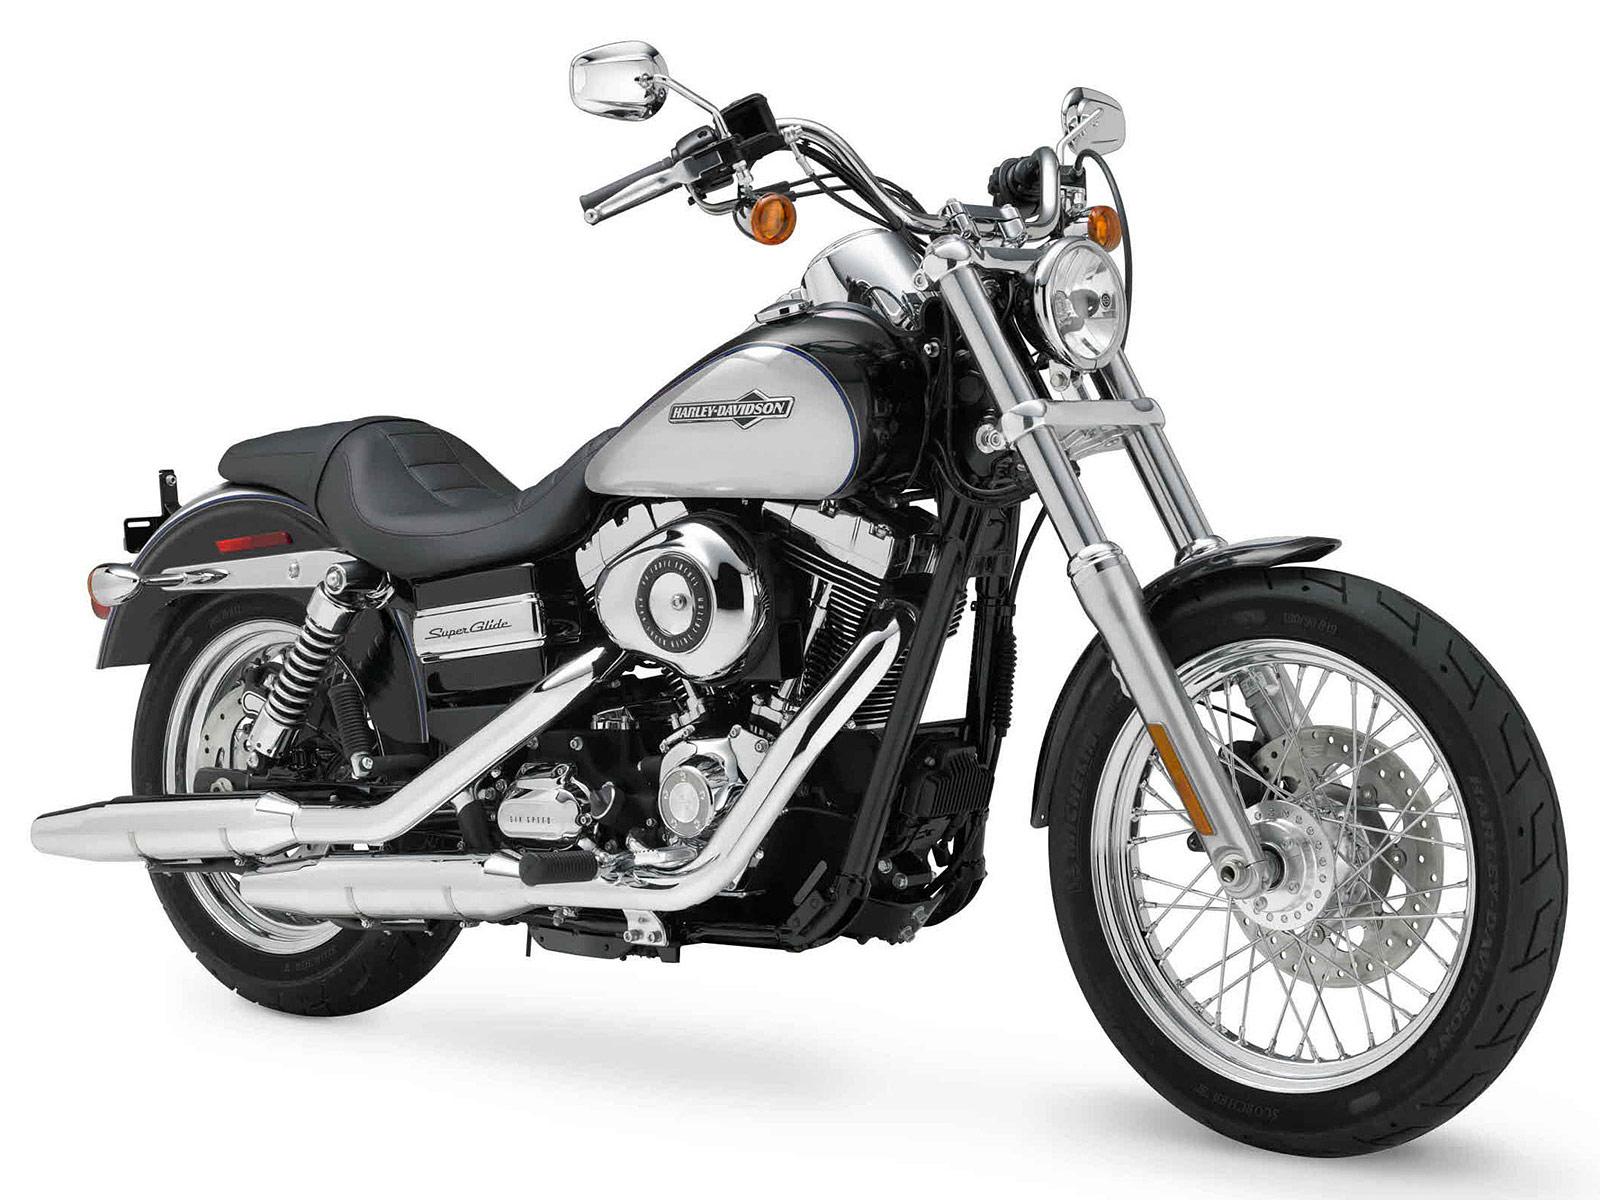 Harley Davidson 2012: 2012 Harley-Davidson FXDC Dyna Super Glide Custom